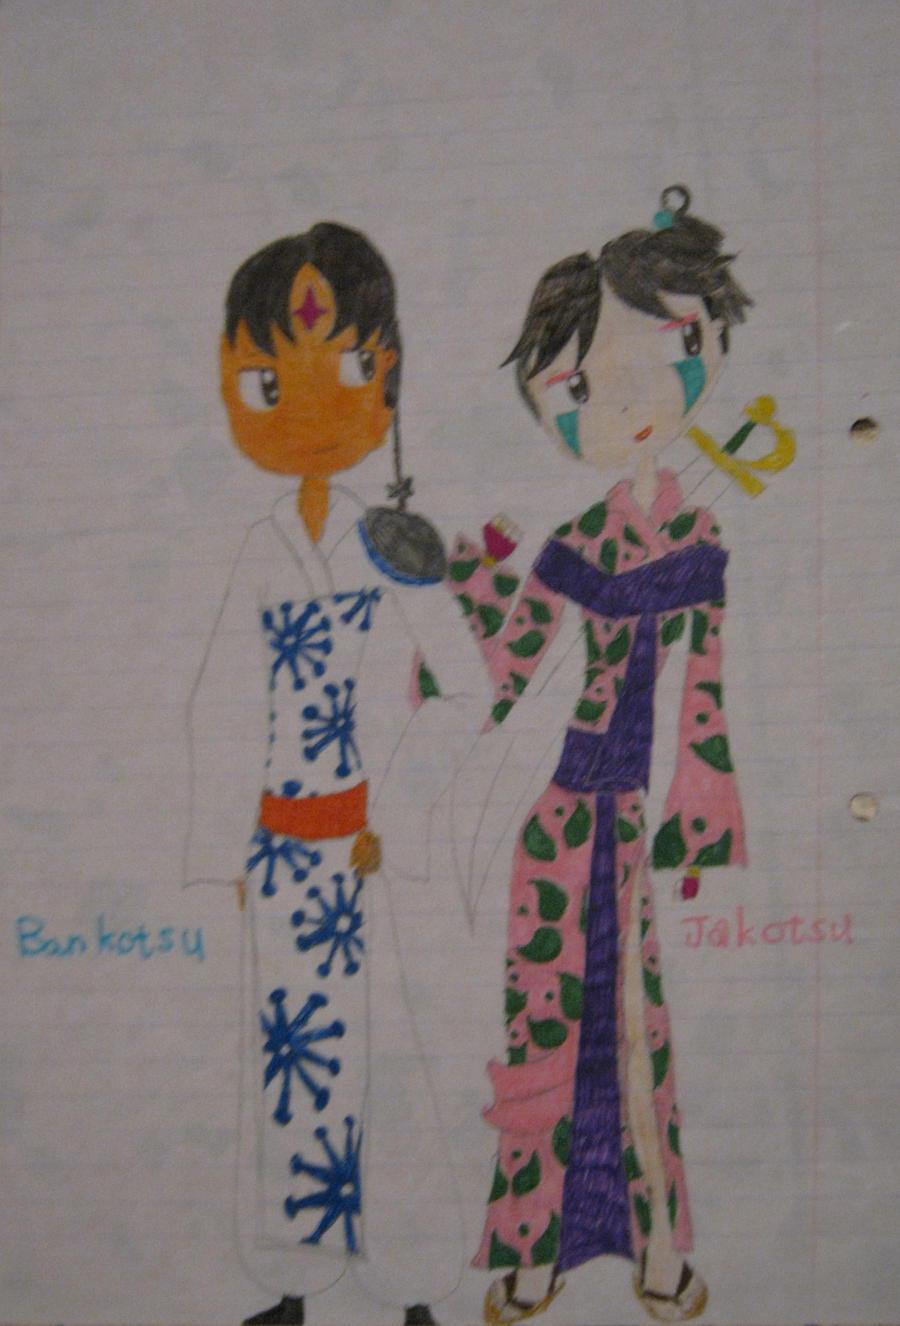 Jakotsu and Bankotsu by EnvitChan